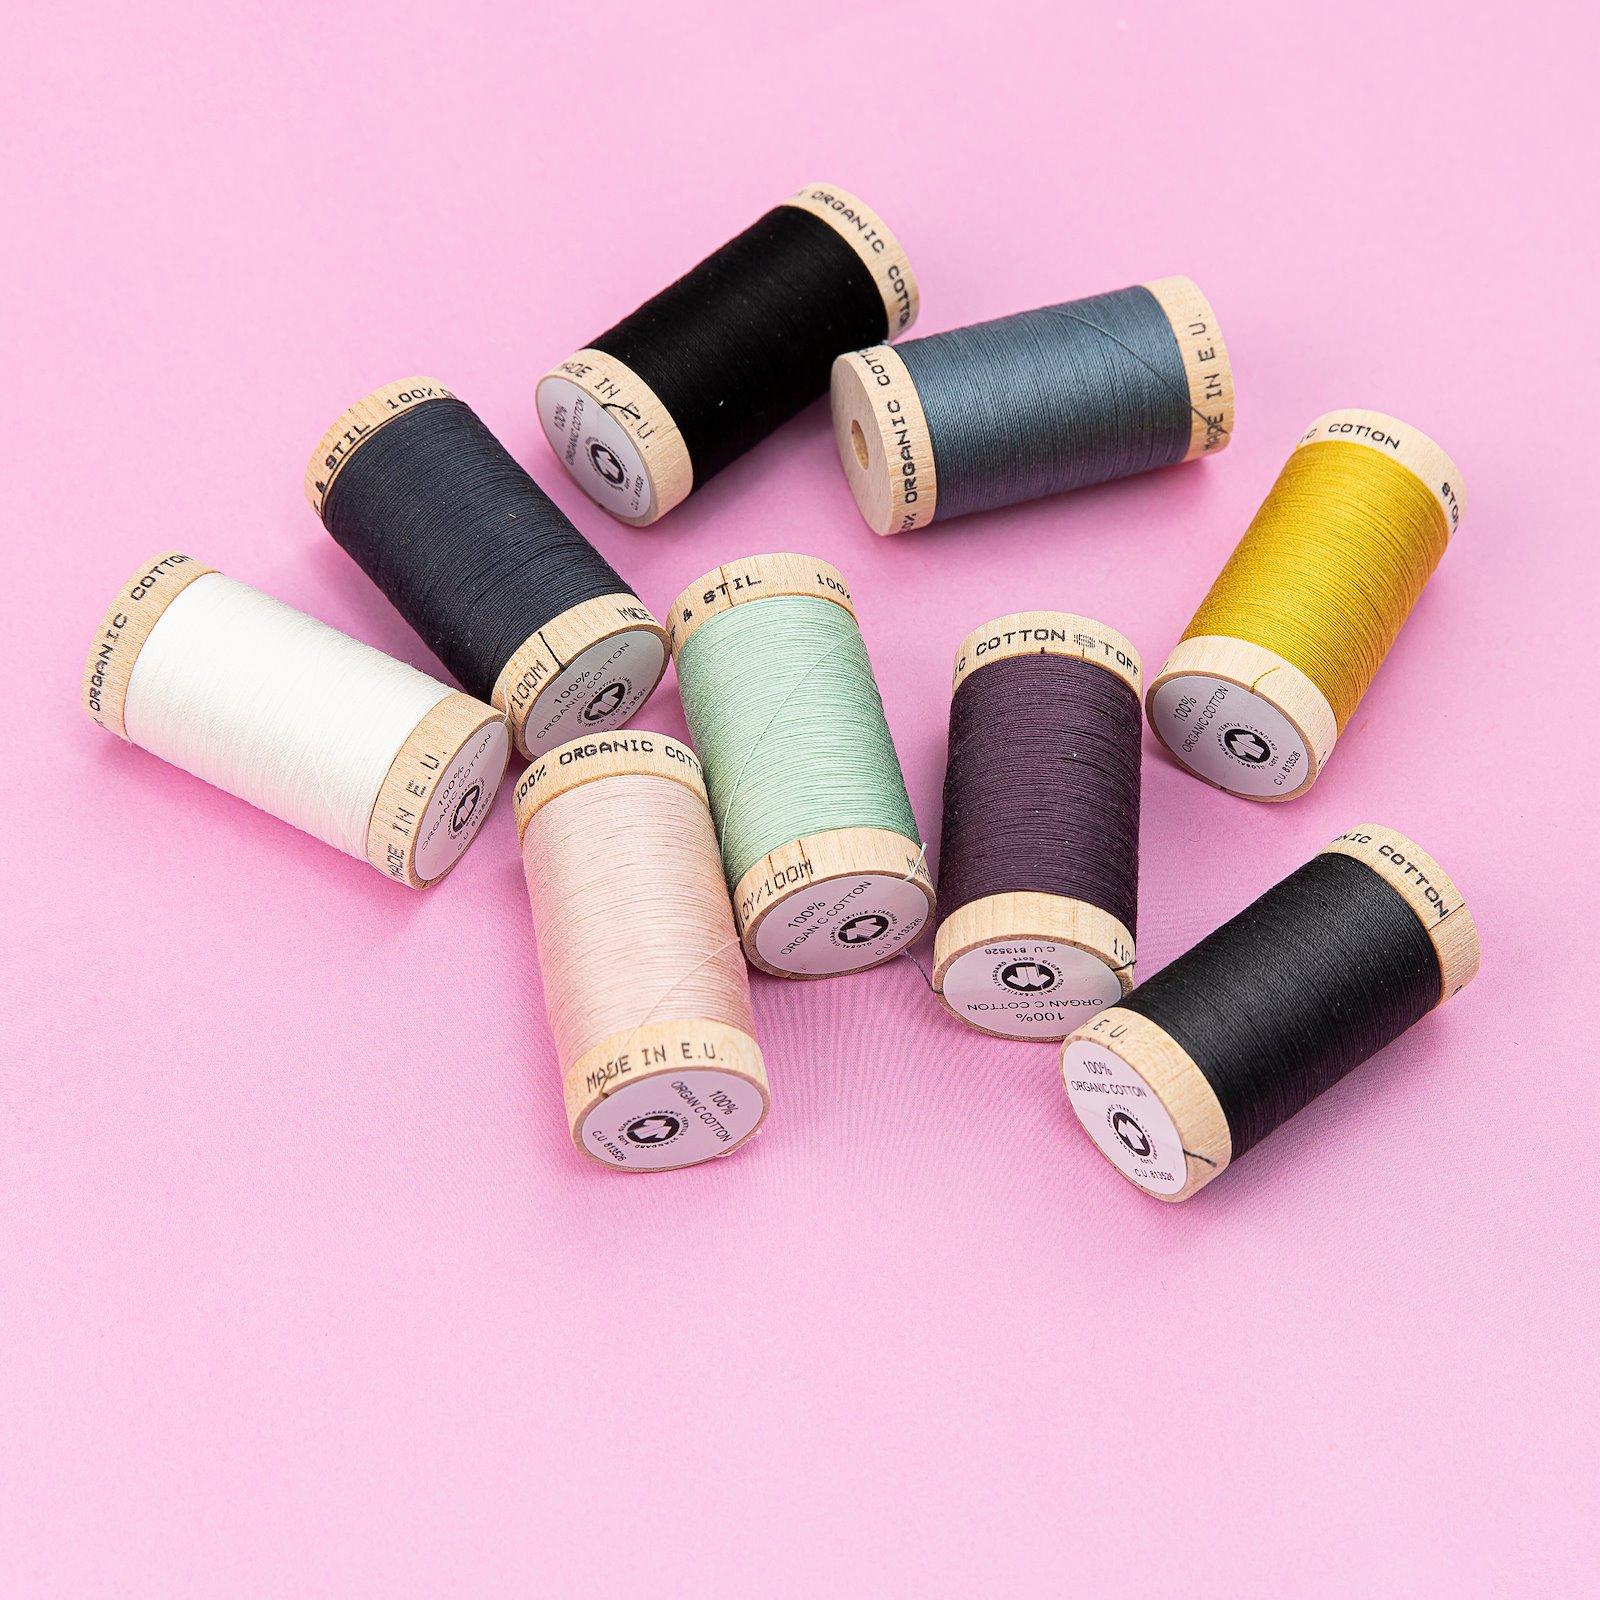 Sewing thread organic cotton navy 100m 18092_18033_18042_18072_18017_18043_18023_18021_18002_bundle